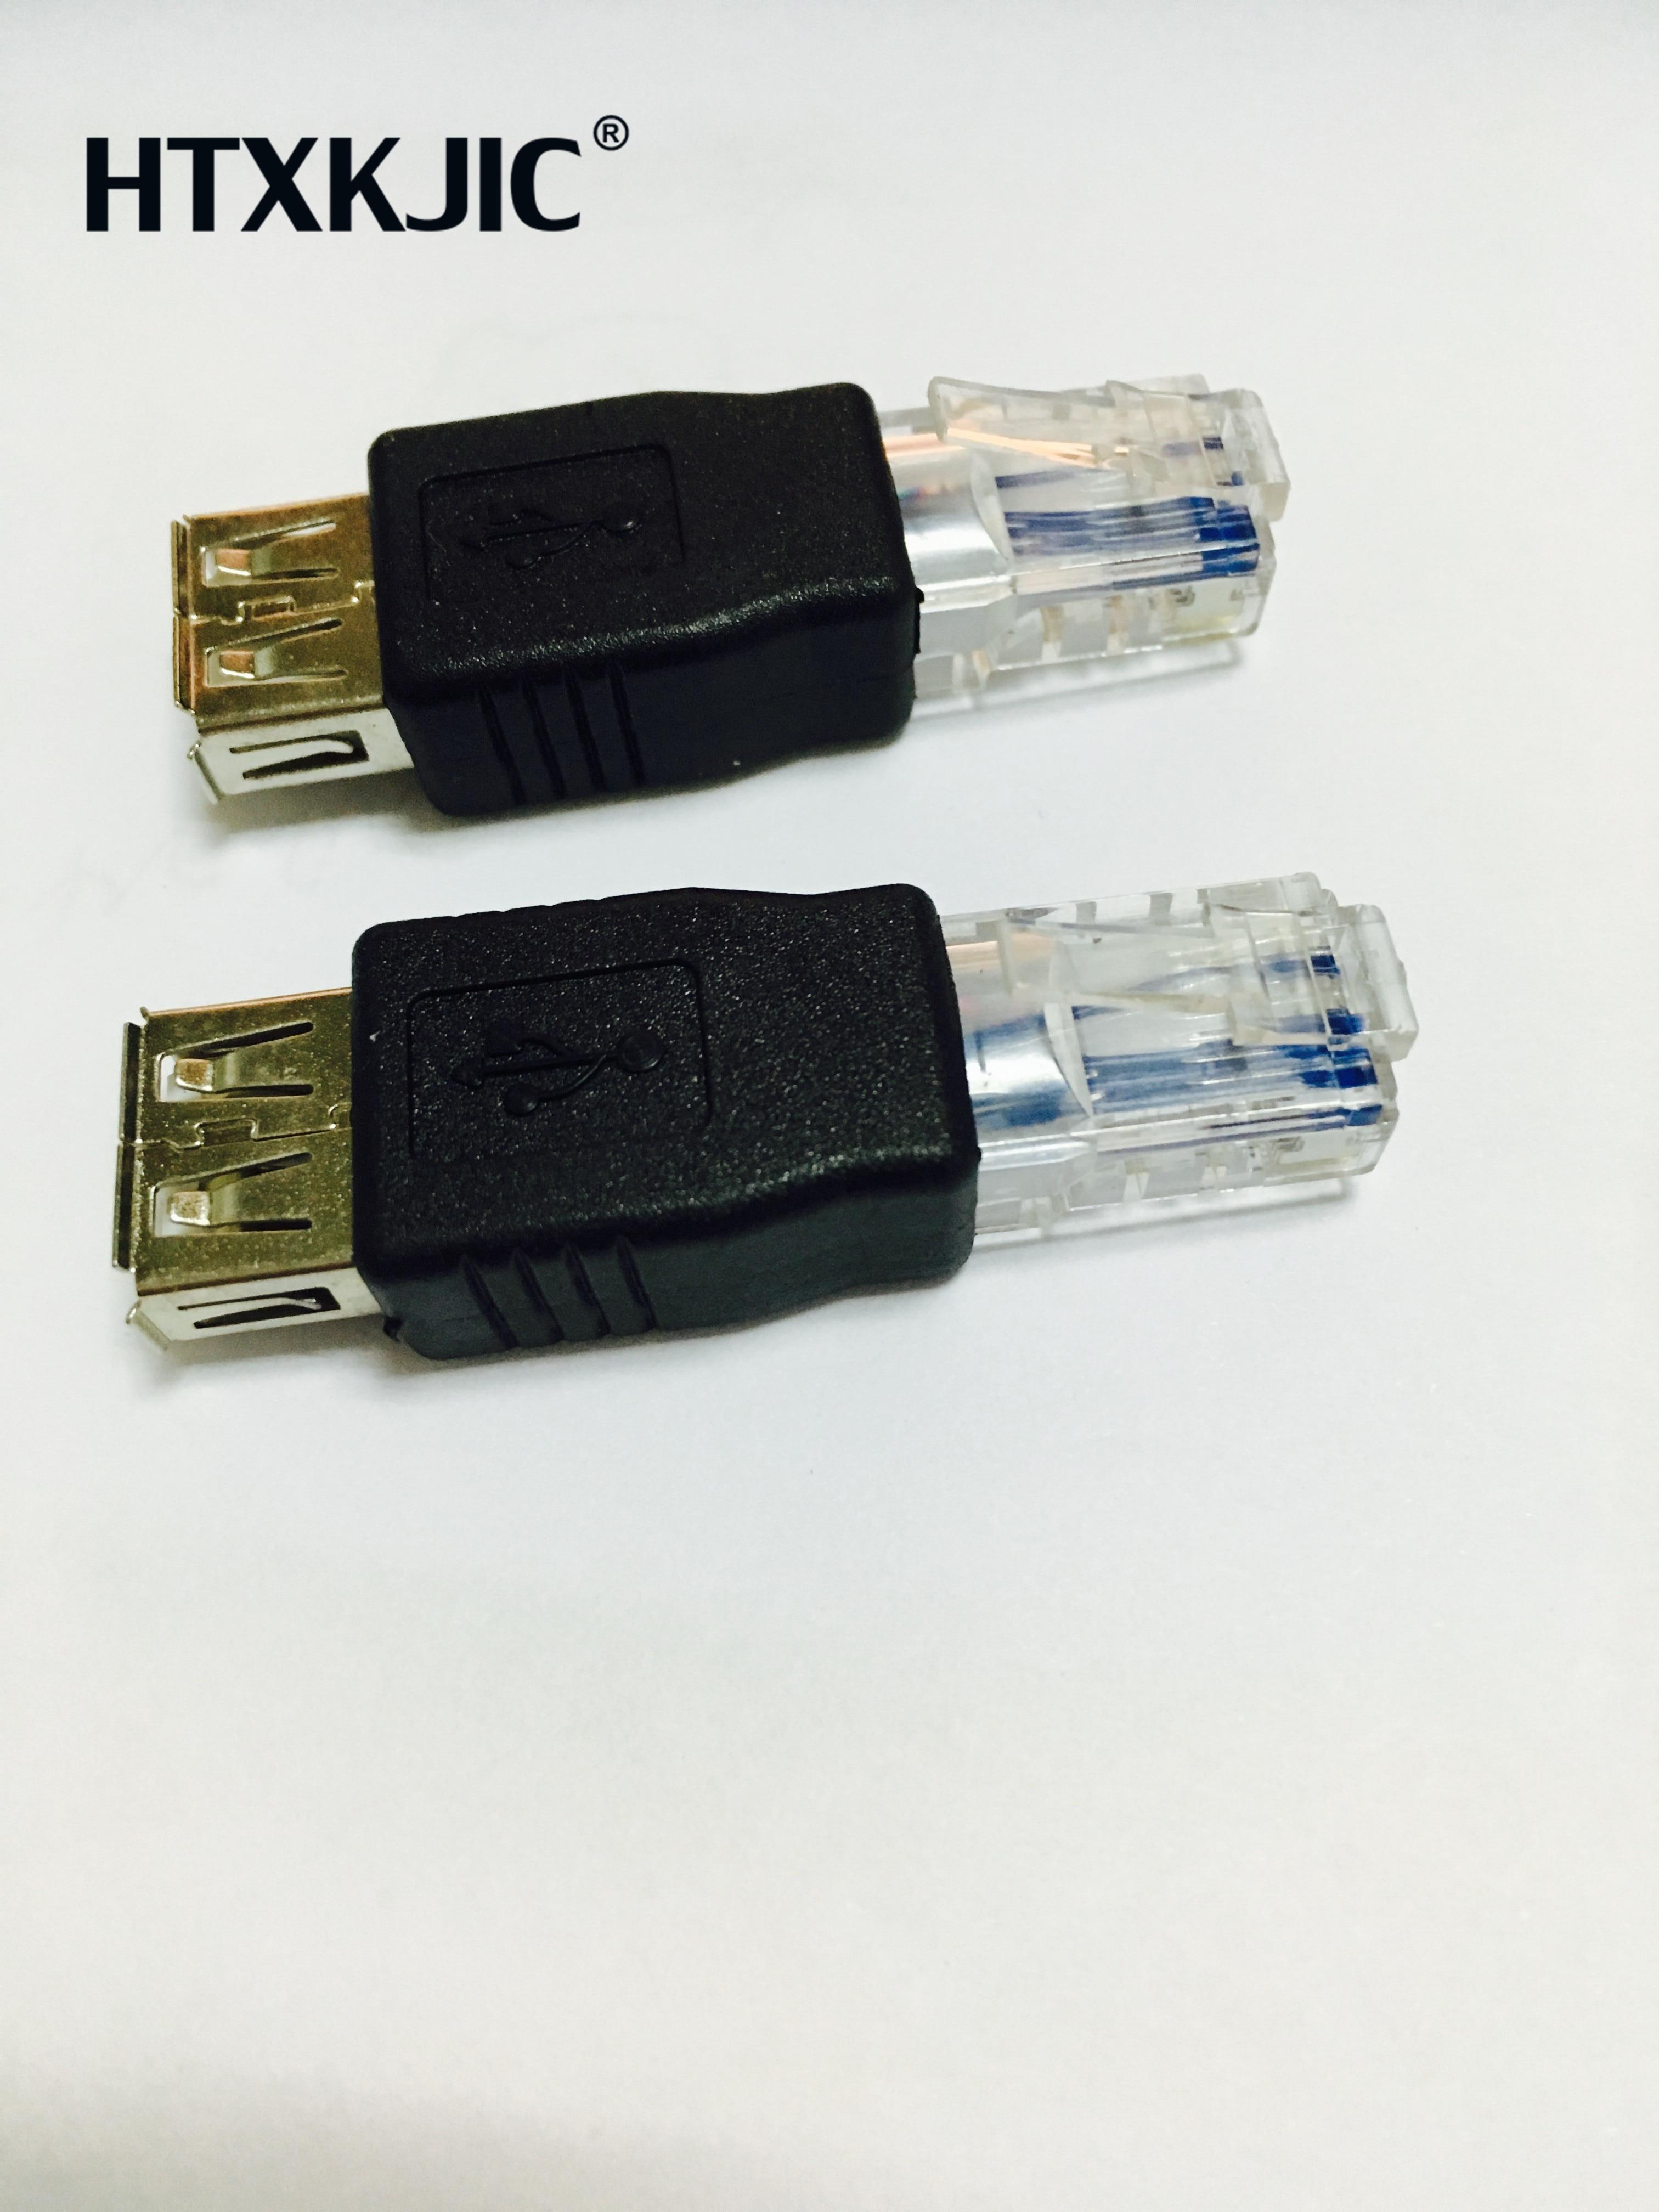 1 Uds USB tipo A hembra A Ethernet Internet RJ45 macho Adaptador convertidor de red enchufe